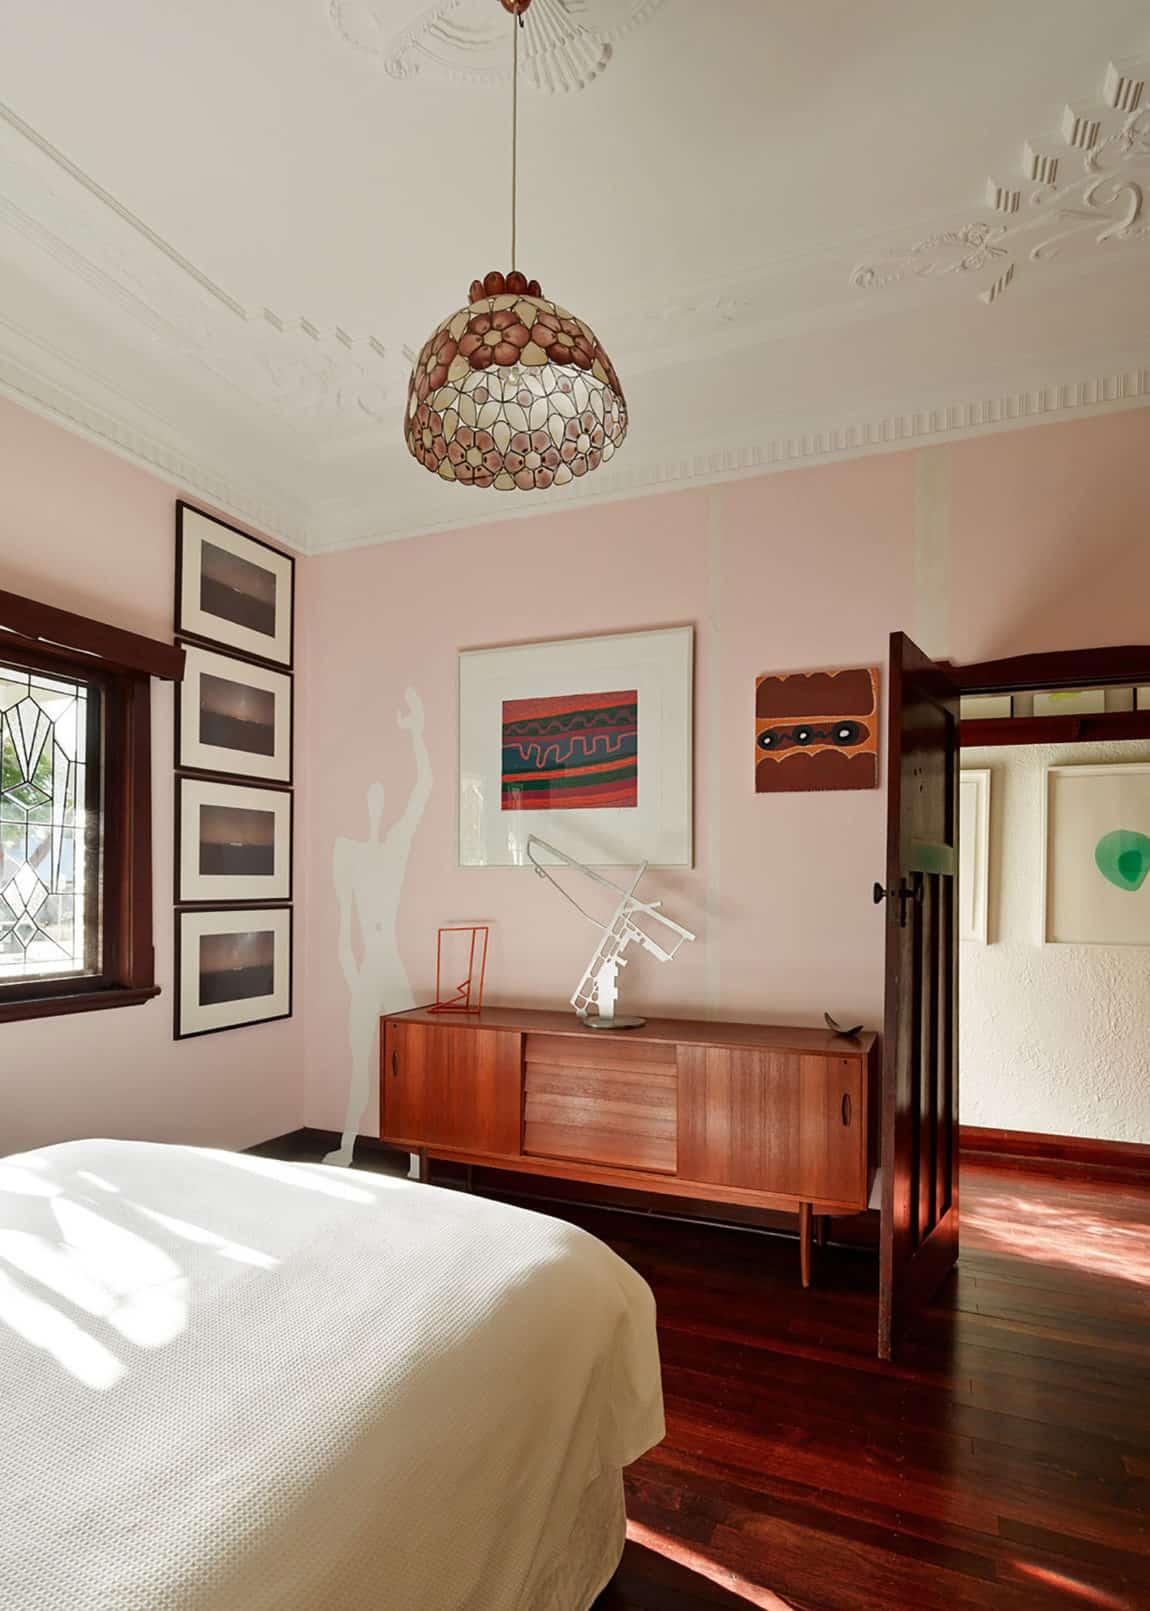 Casa 31_4 Room House by Iredale Pedersen Hook (27)